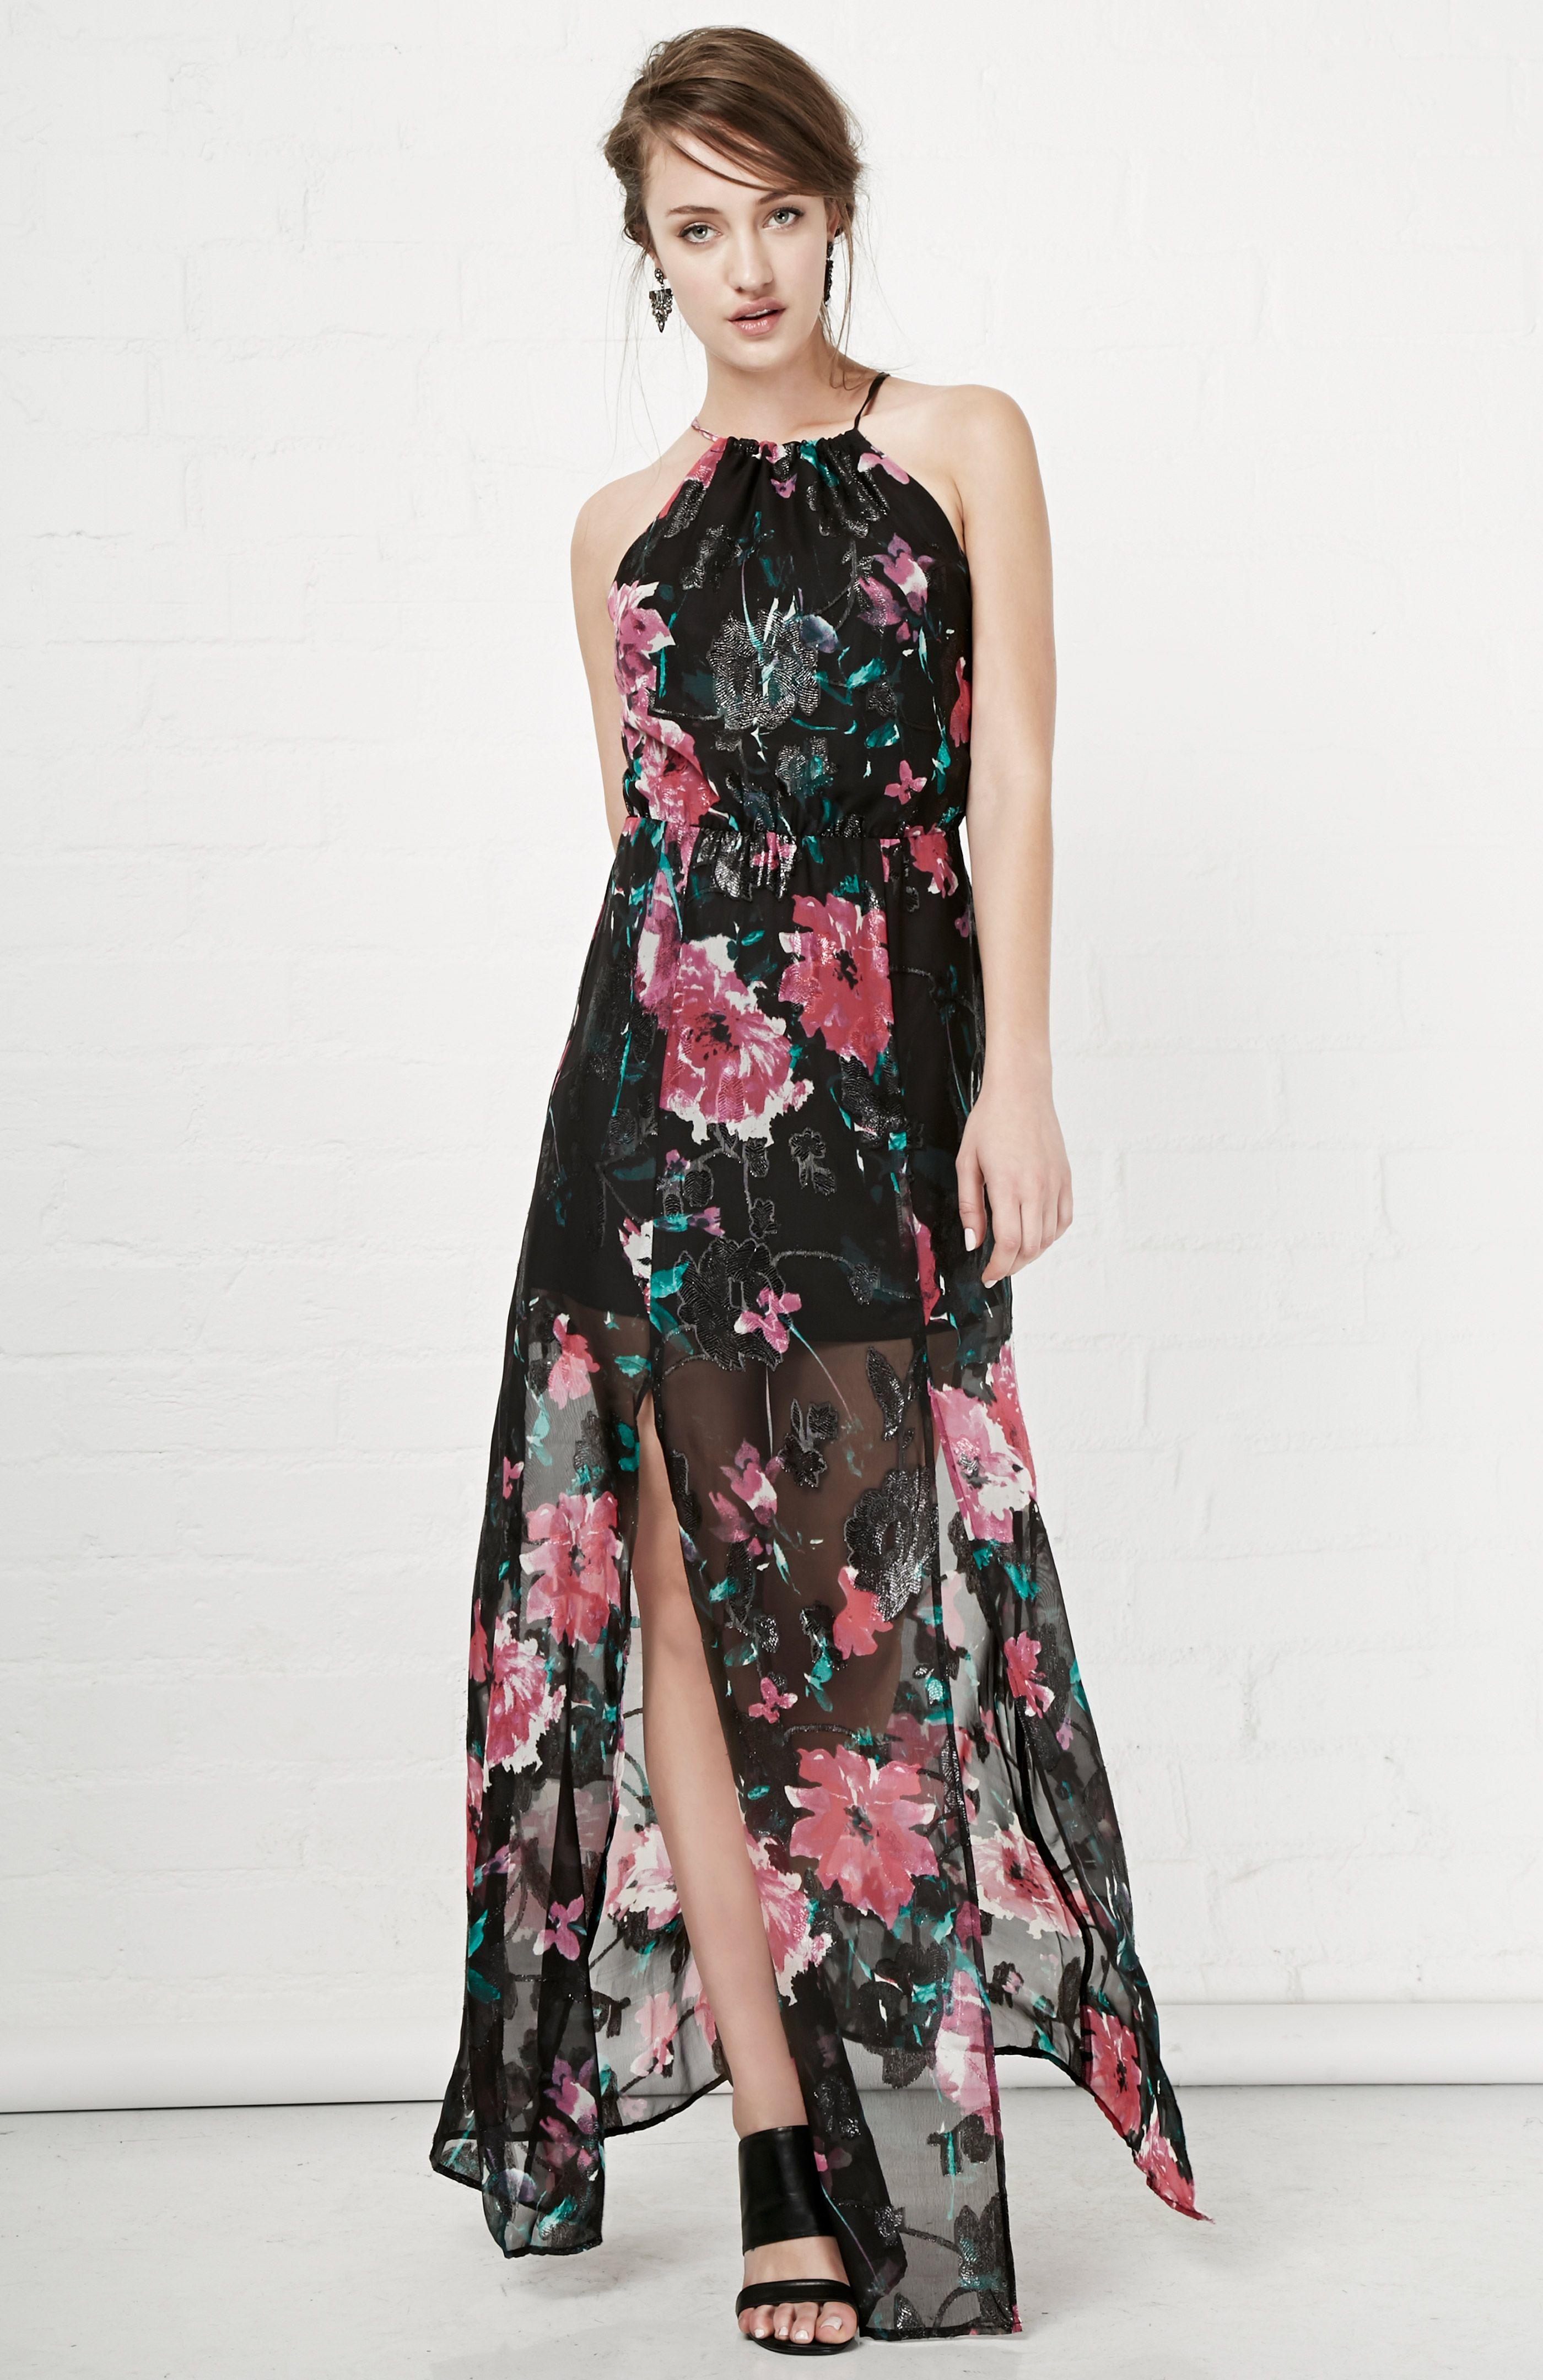 Tularosa bella maxi dress in black s at dailylook fashionable